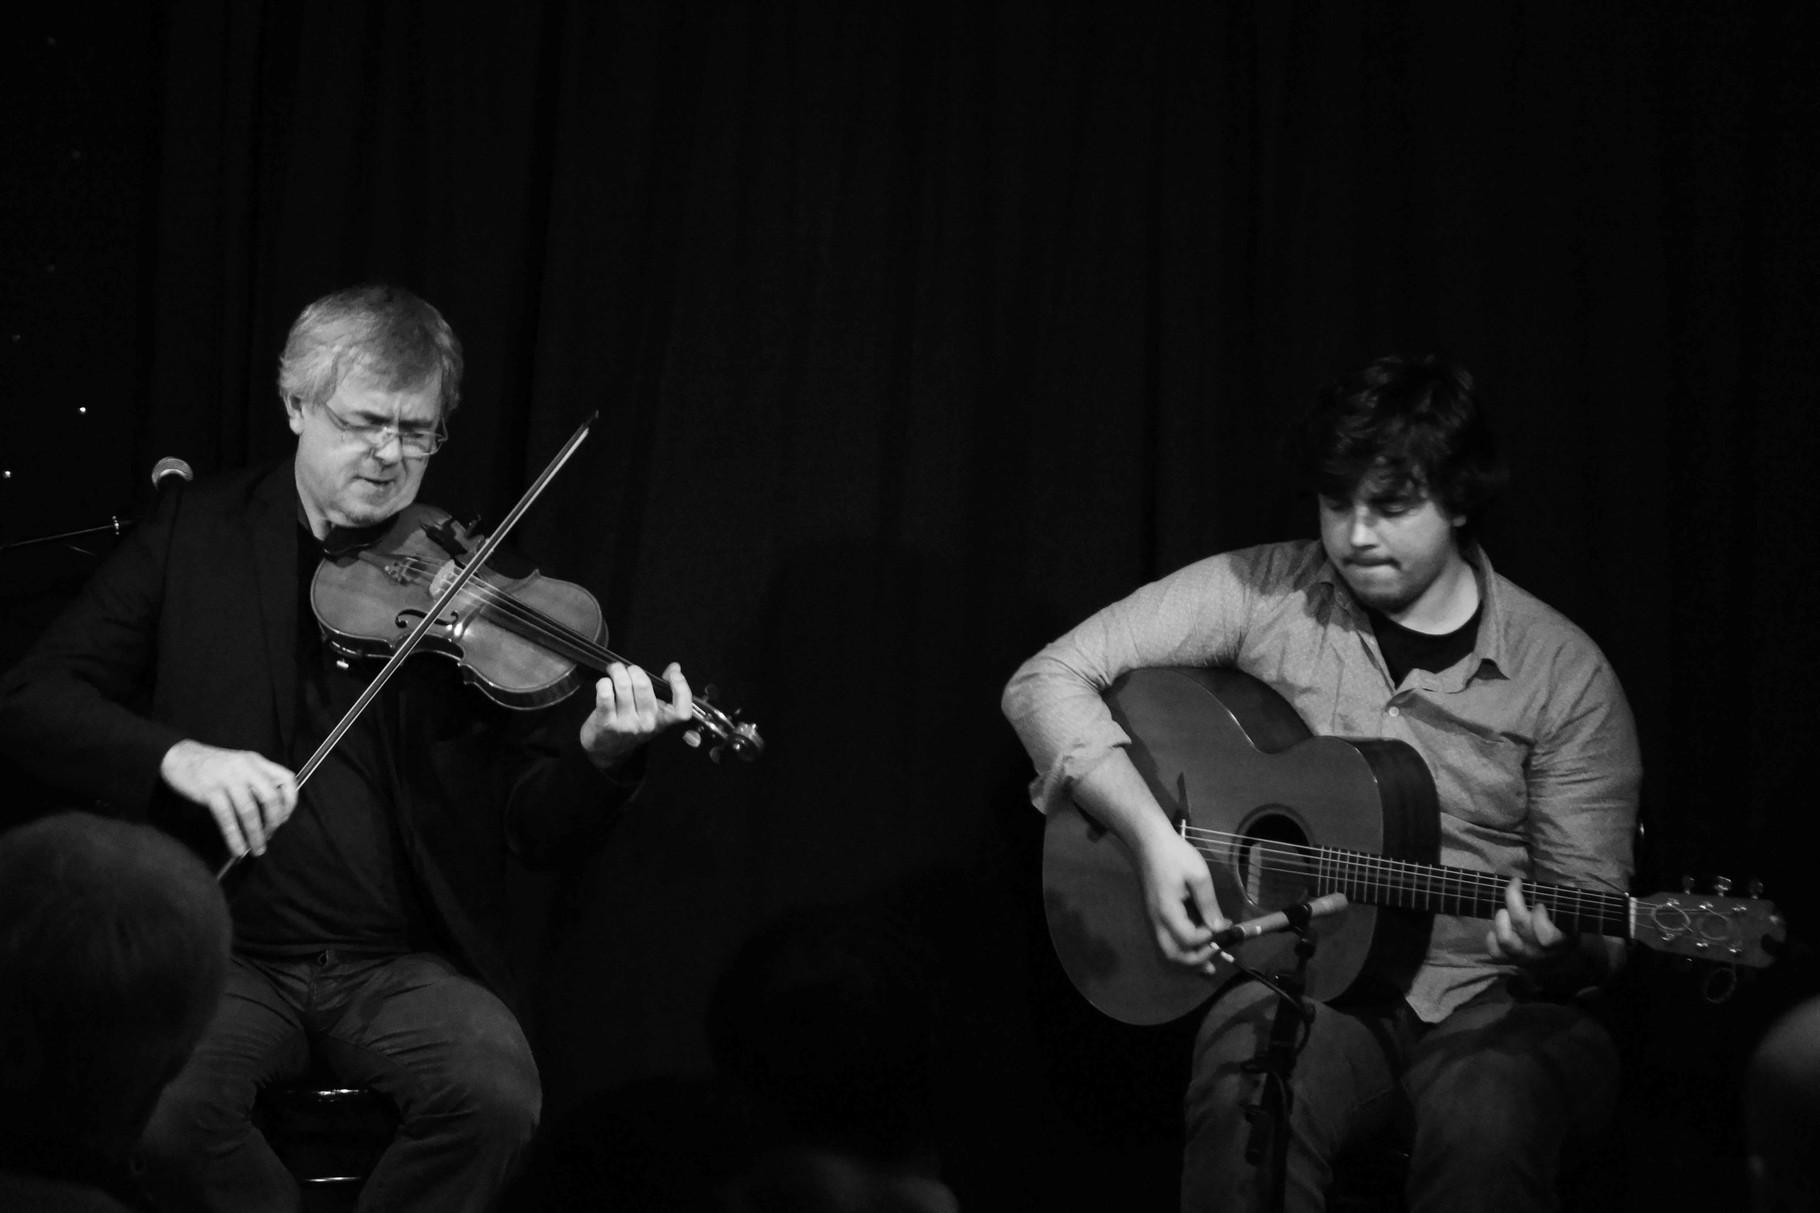 Ronan et Arthur Pinc